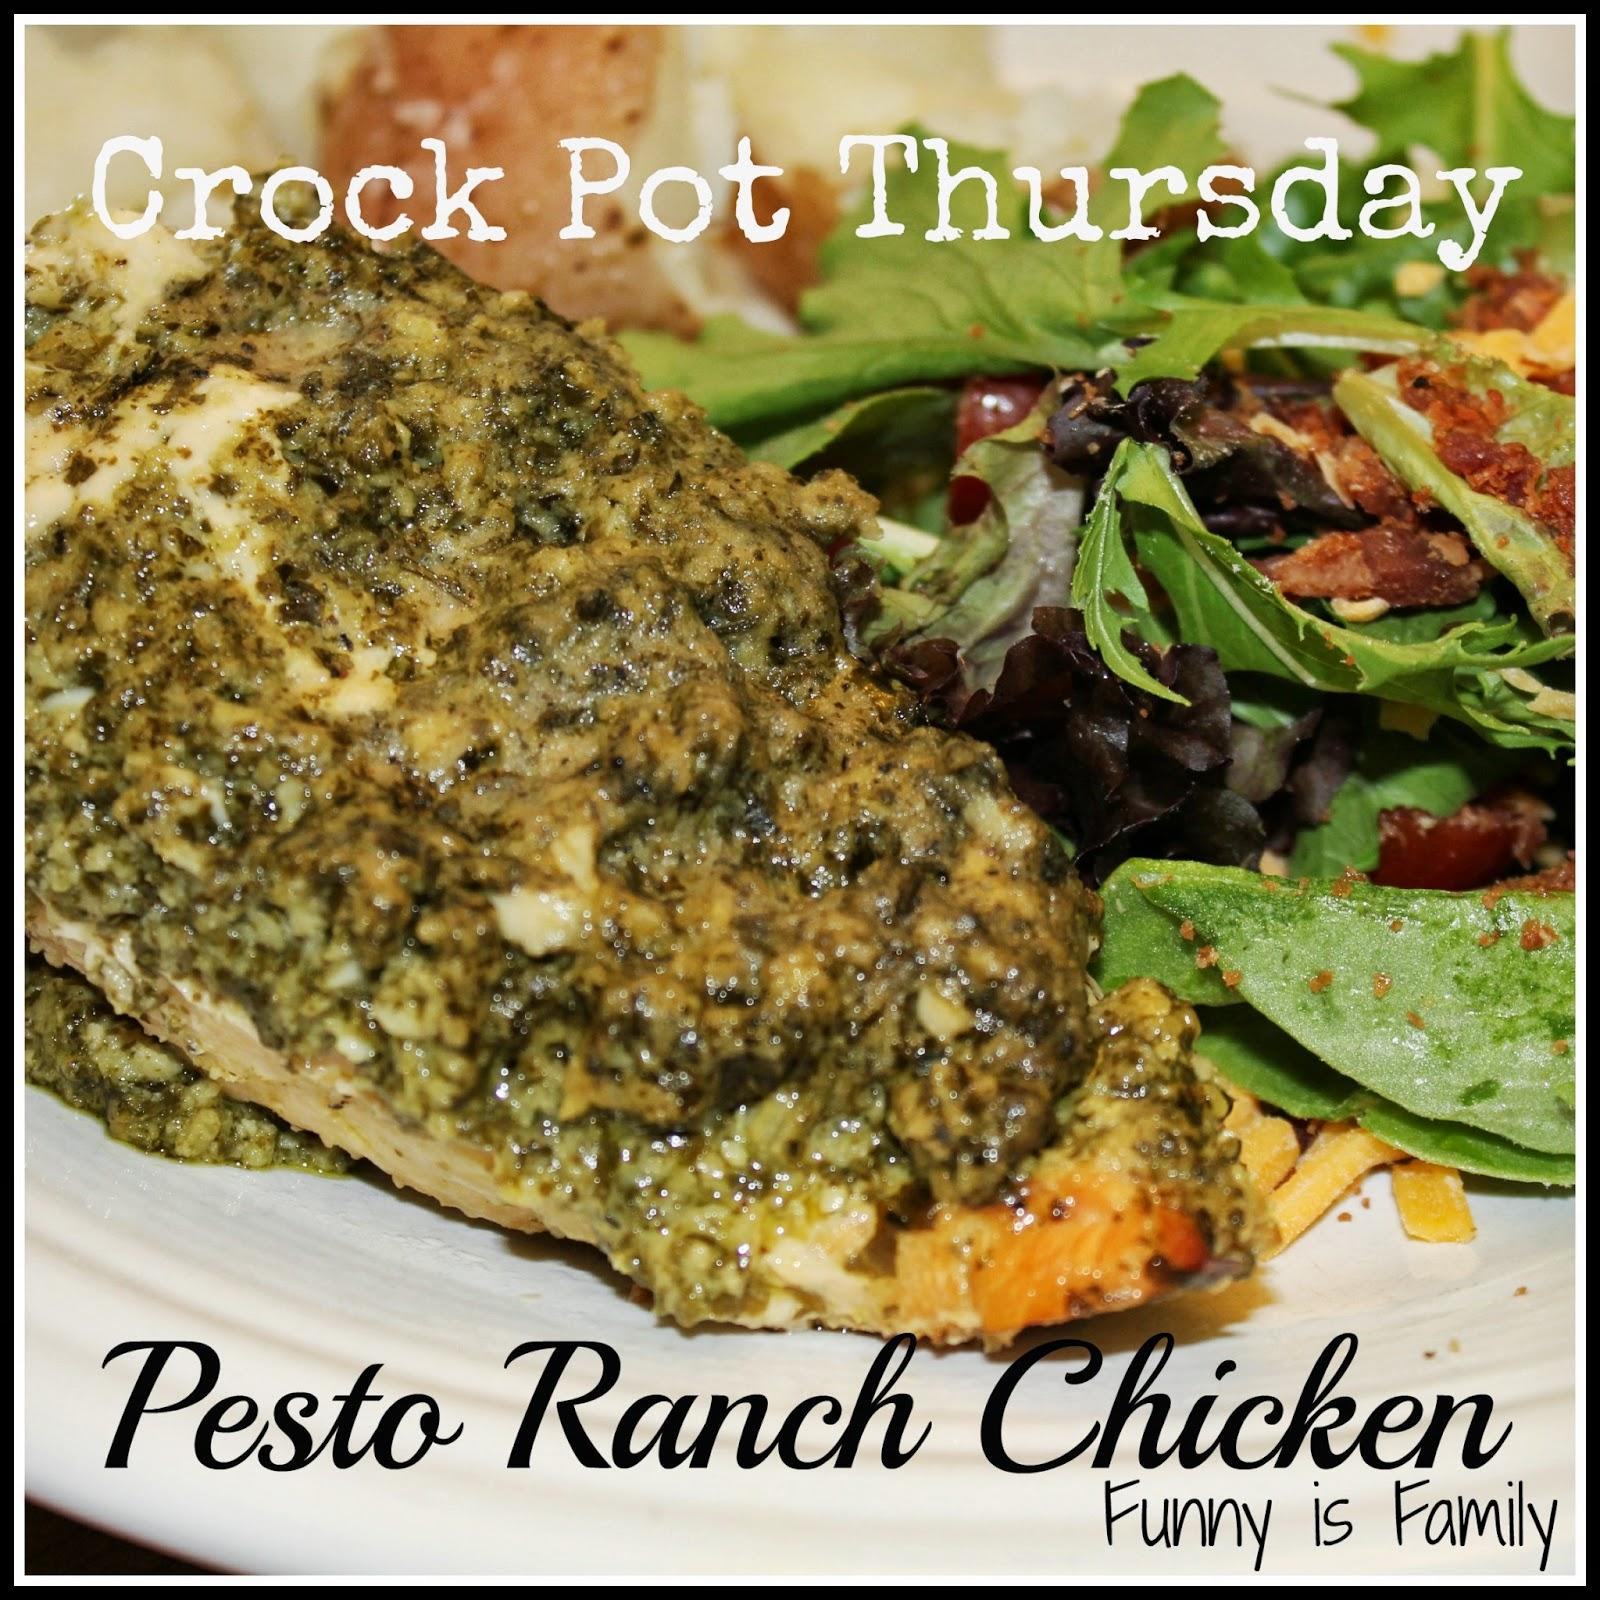 Pesto Ranch Chicken